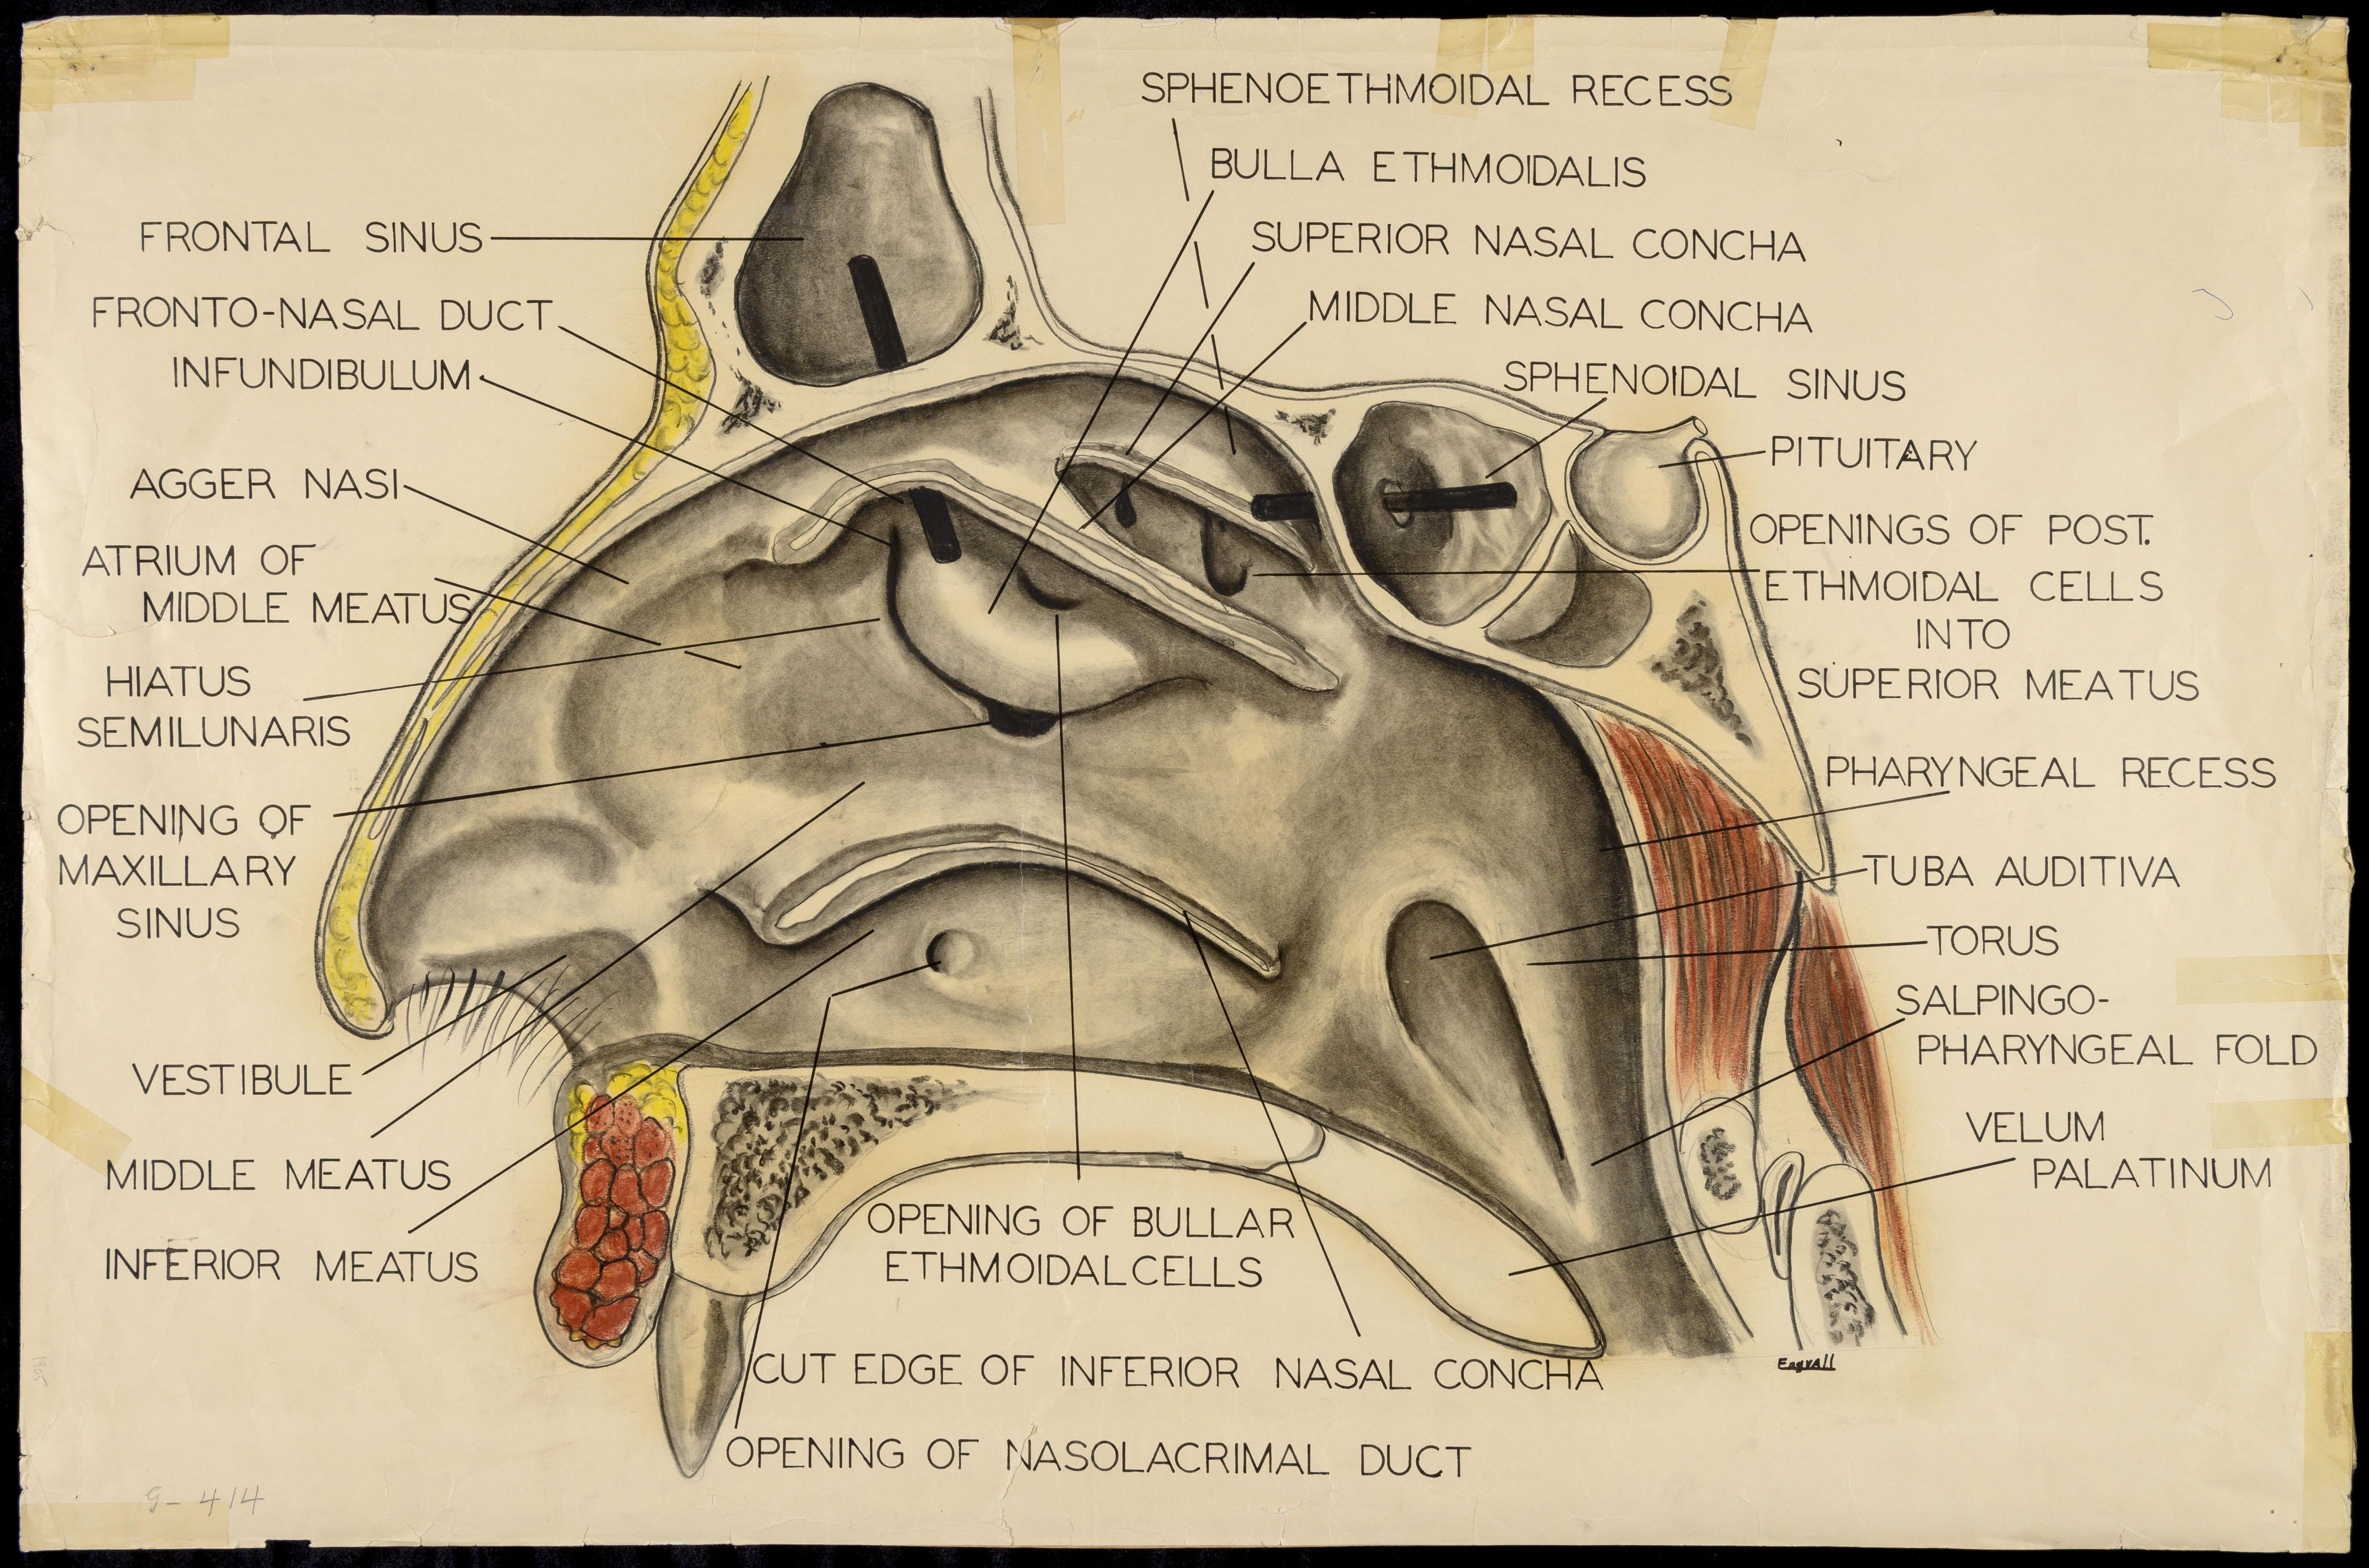 Frontal Sinus Fronto Nasal Duct Infundibulum Agger Nasi Atrium